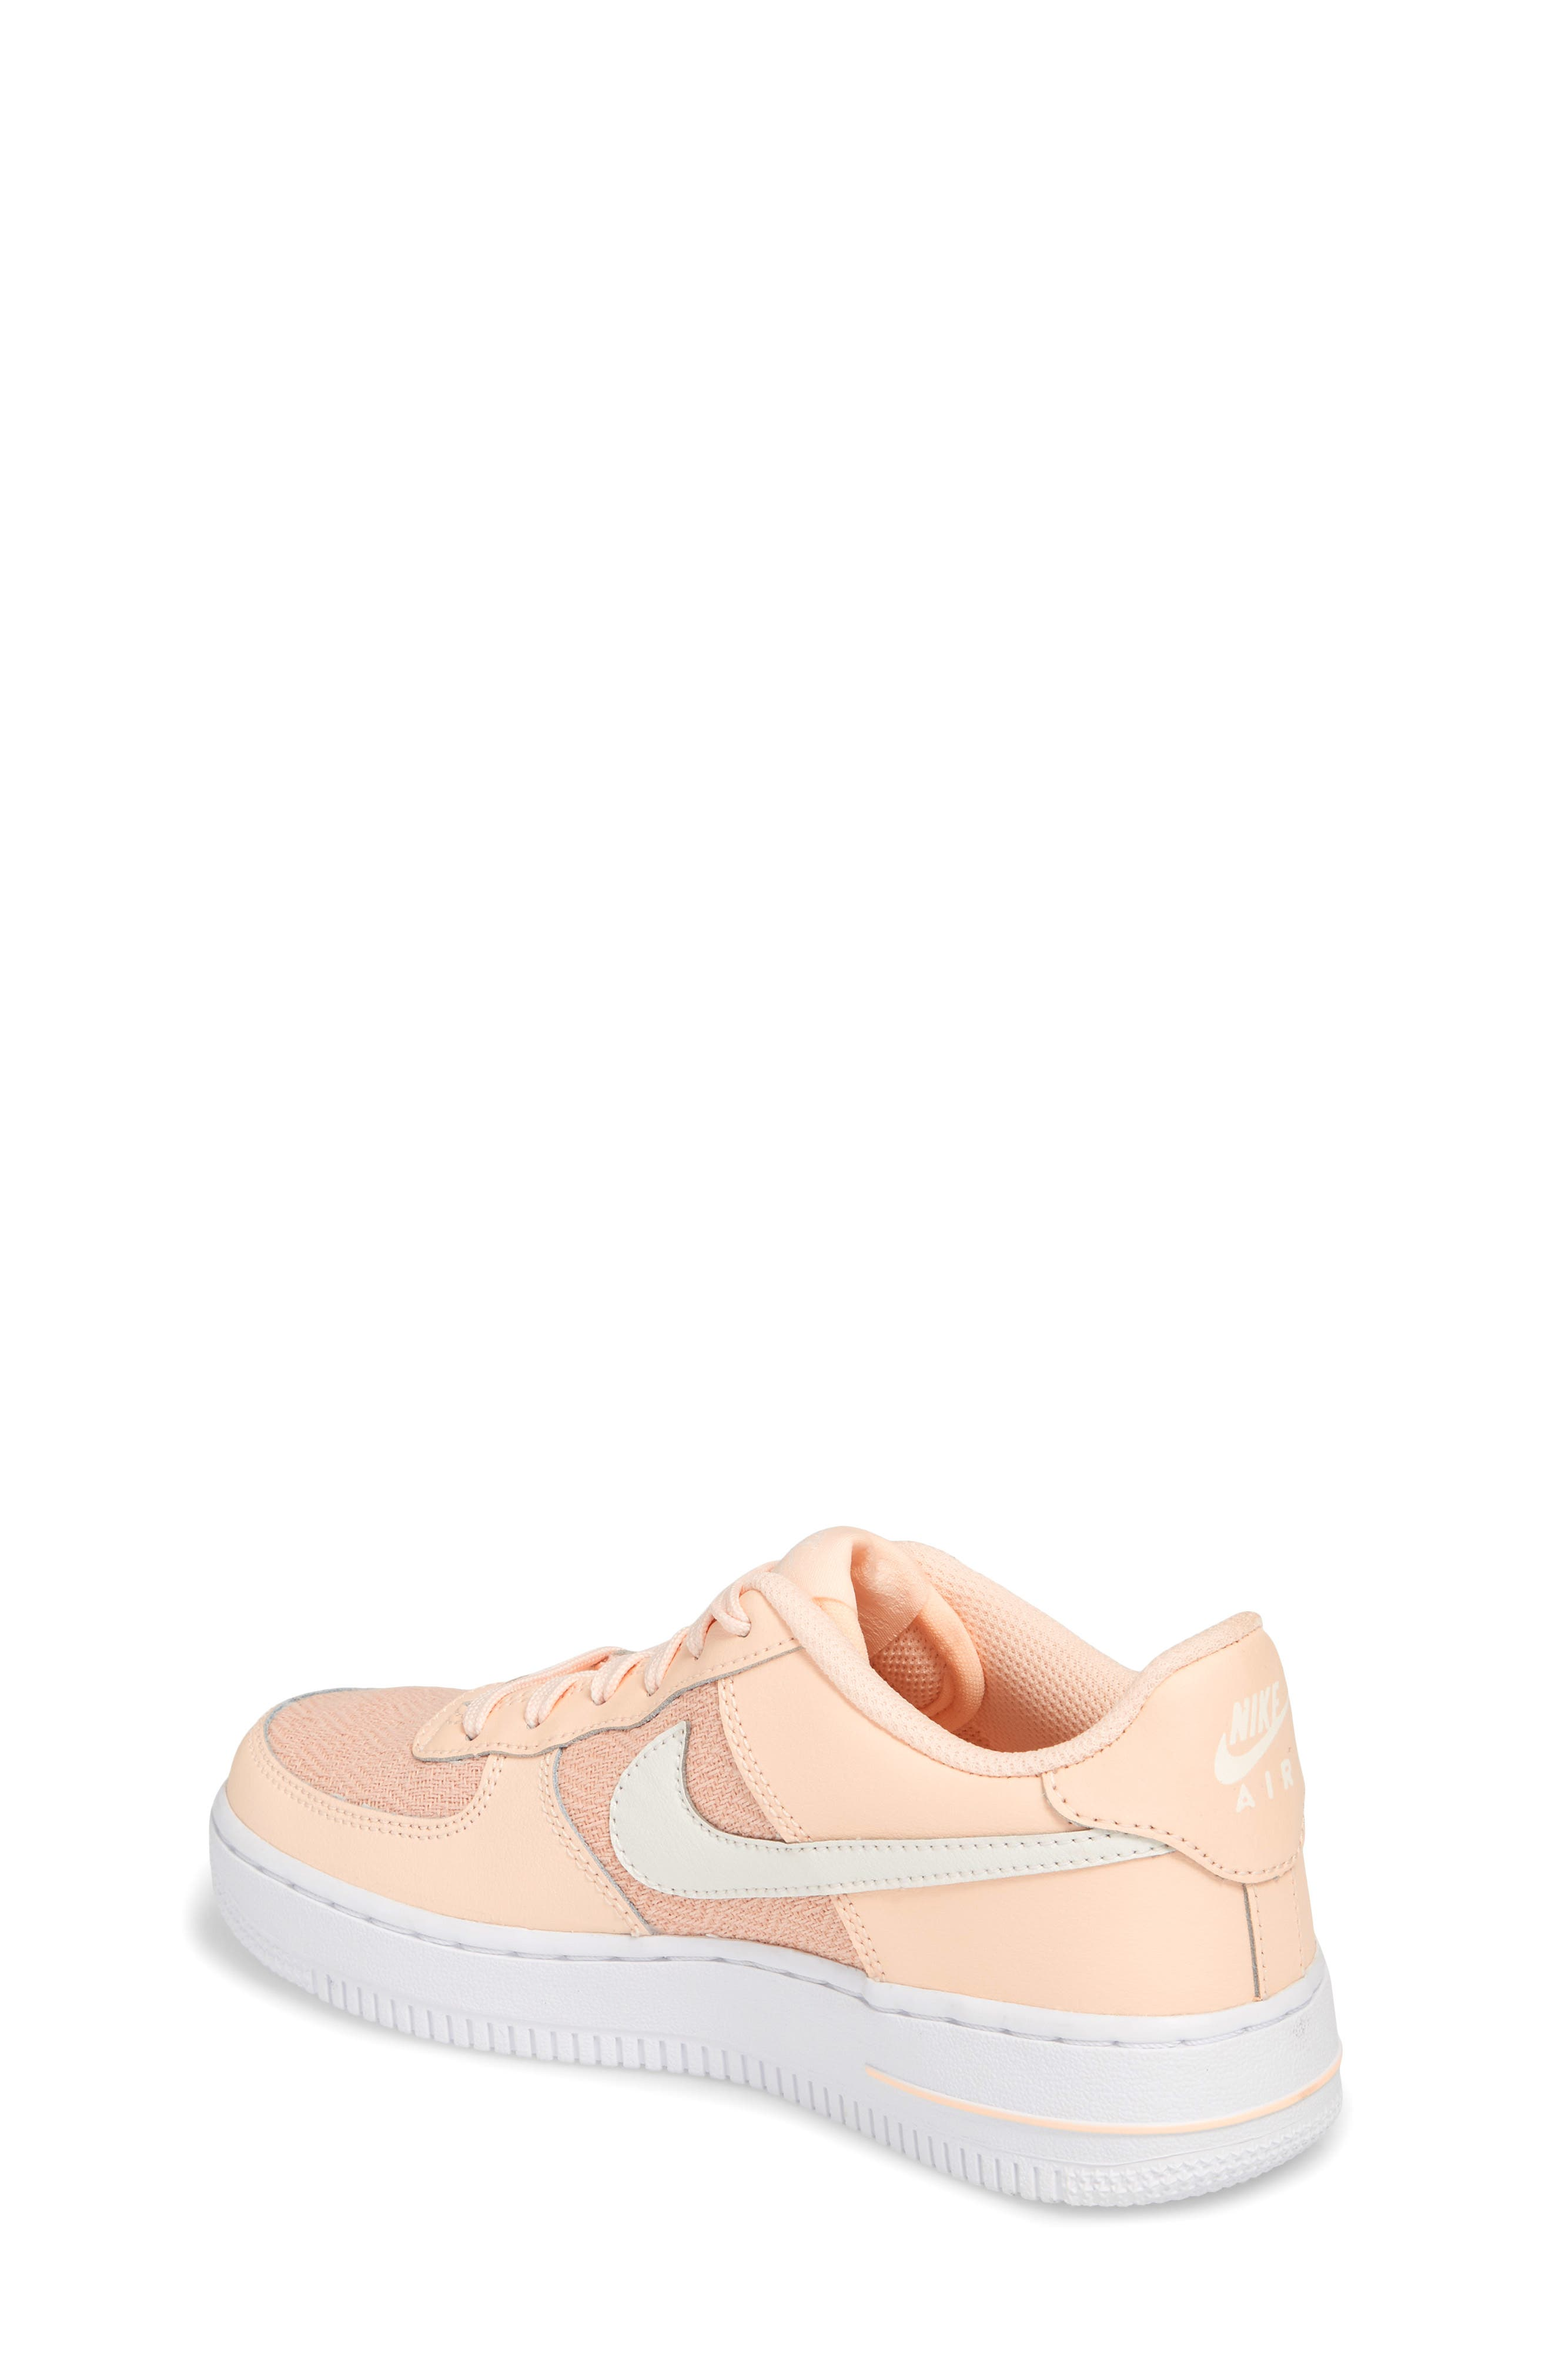 Air Force 1 LV8 Sneaker,                             Alternate thumbnail 8, color,